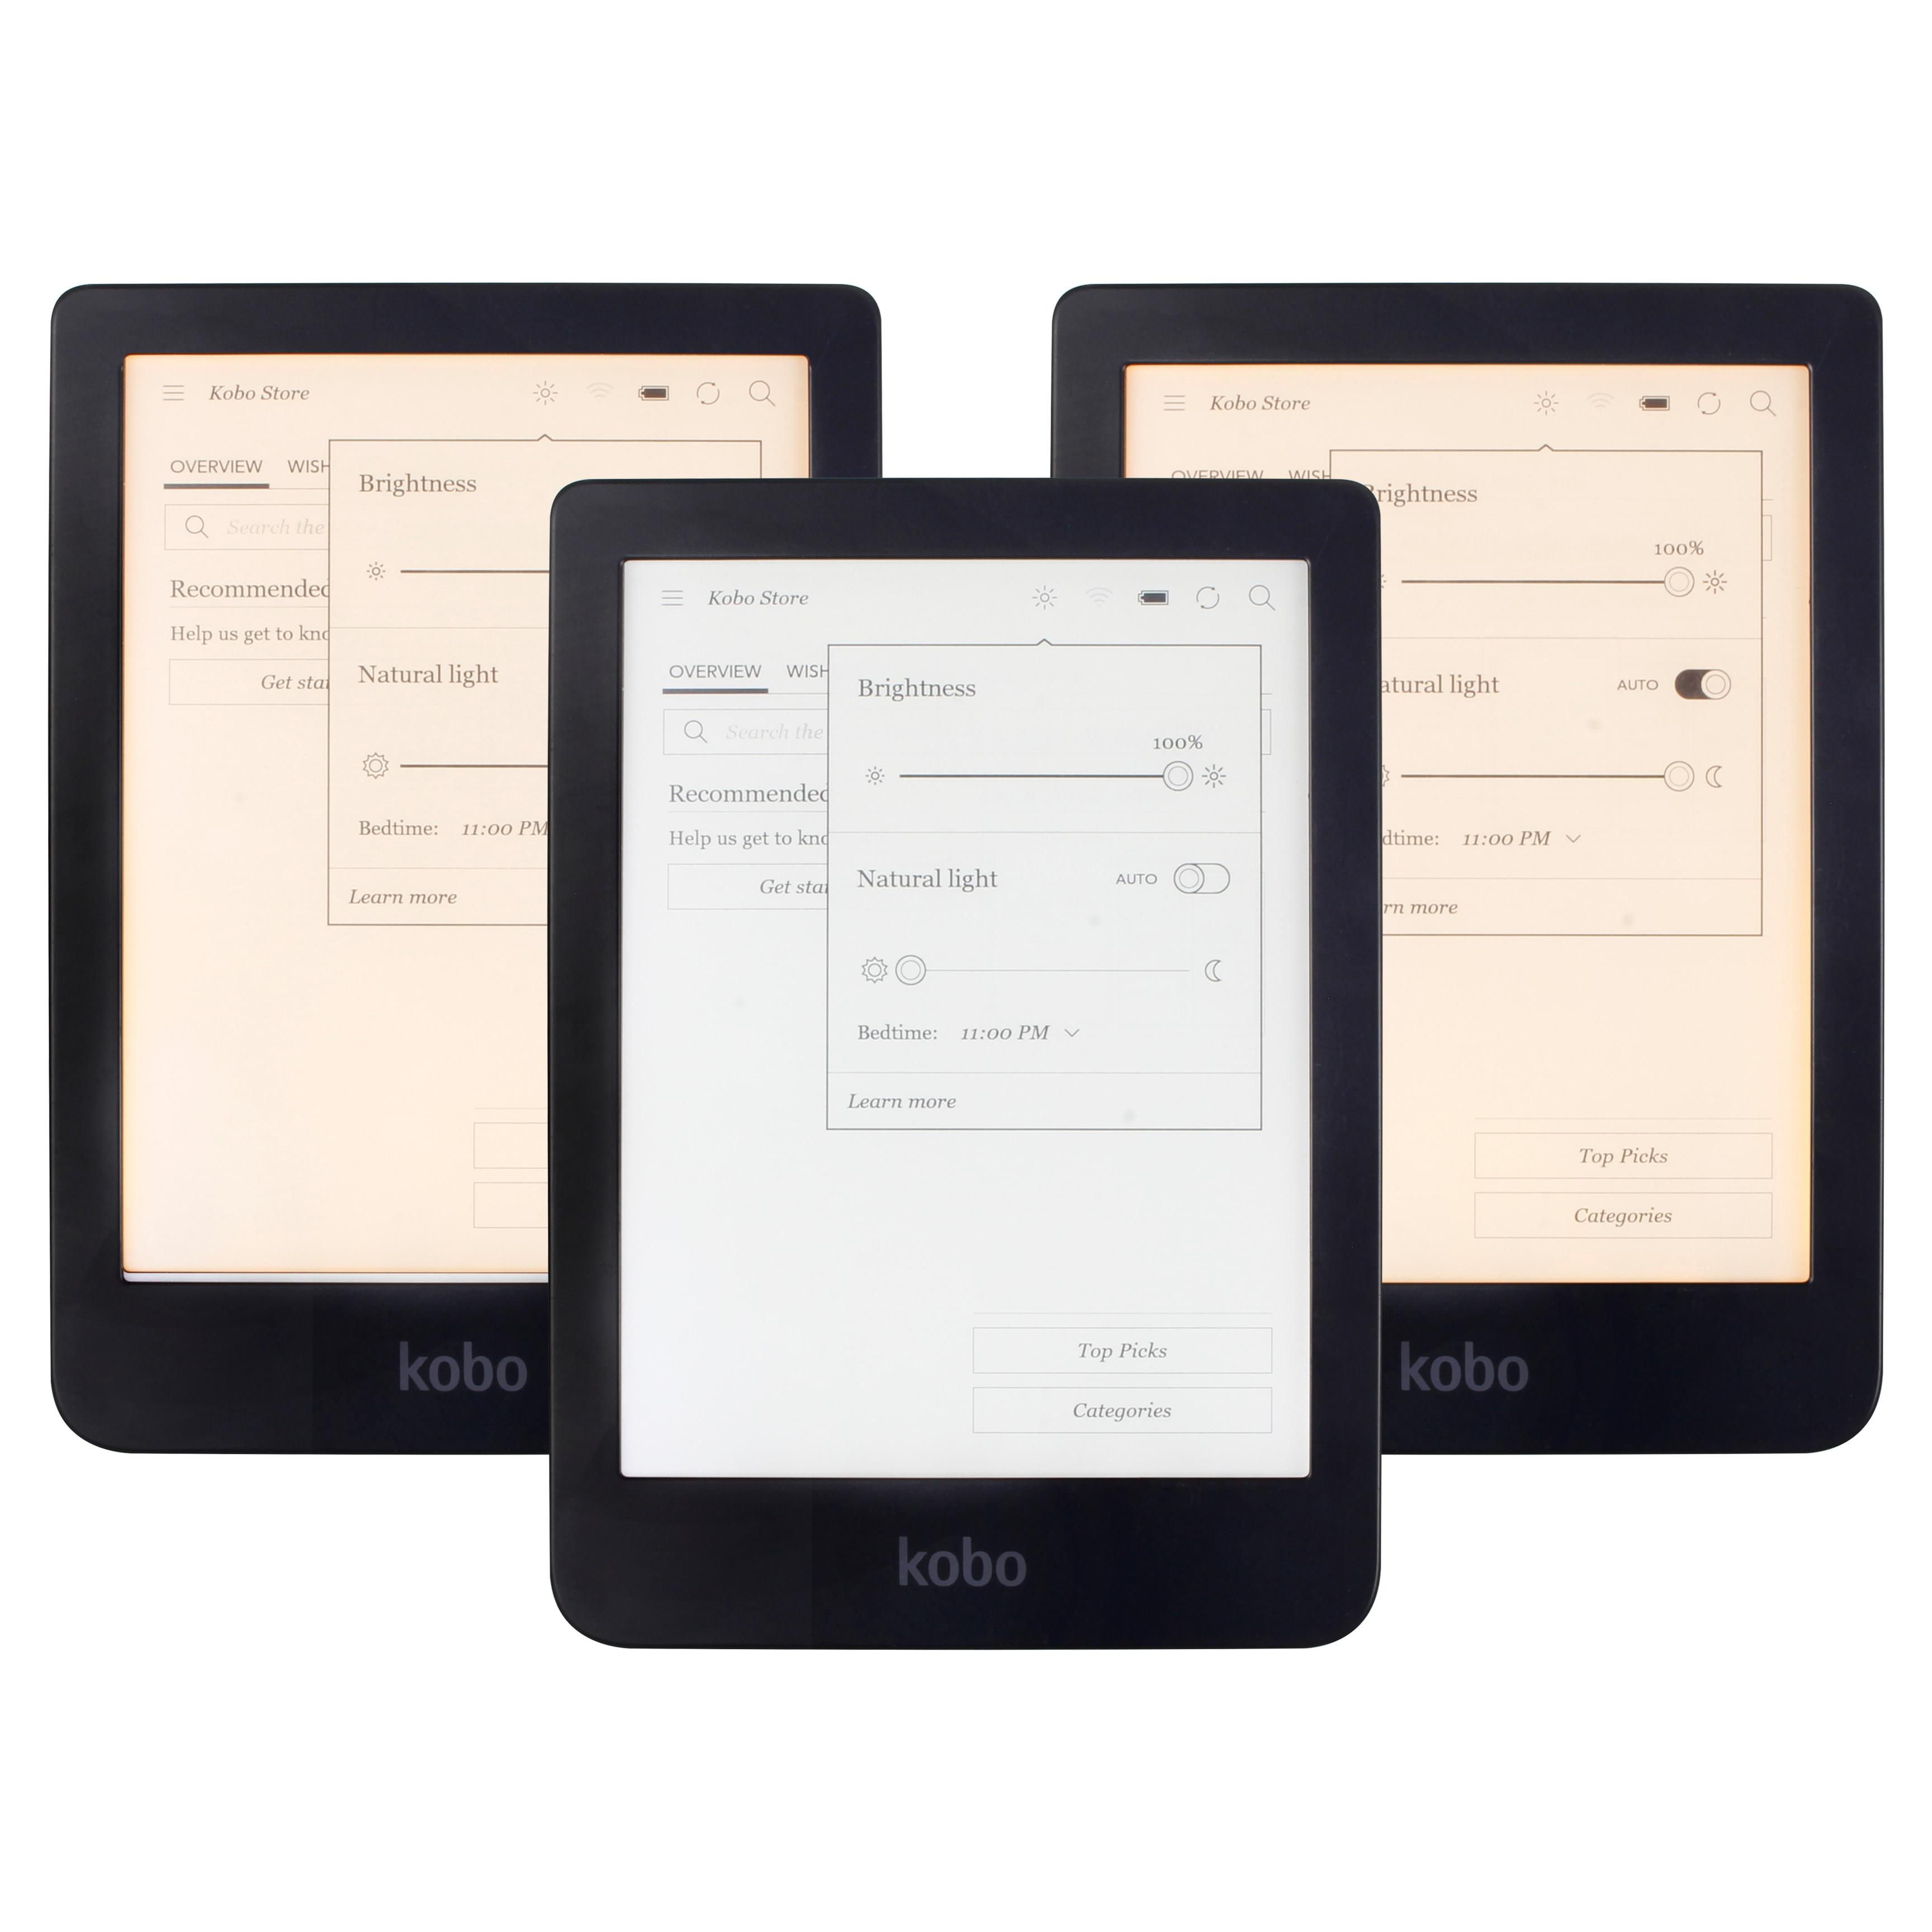 KOBO Clara HD N249 читалка сенсорный экран чтения электронных книг e ink спереди светильник электронные книги ридер белый/теплый белый светильник|Электронные книги|   | АлиЭкспресс